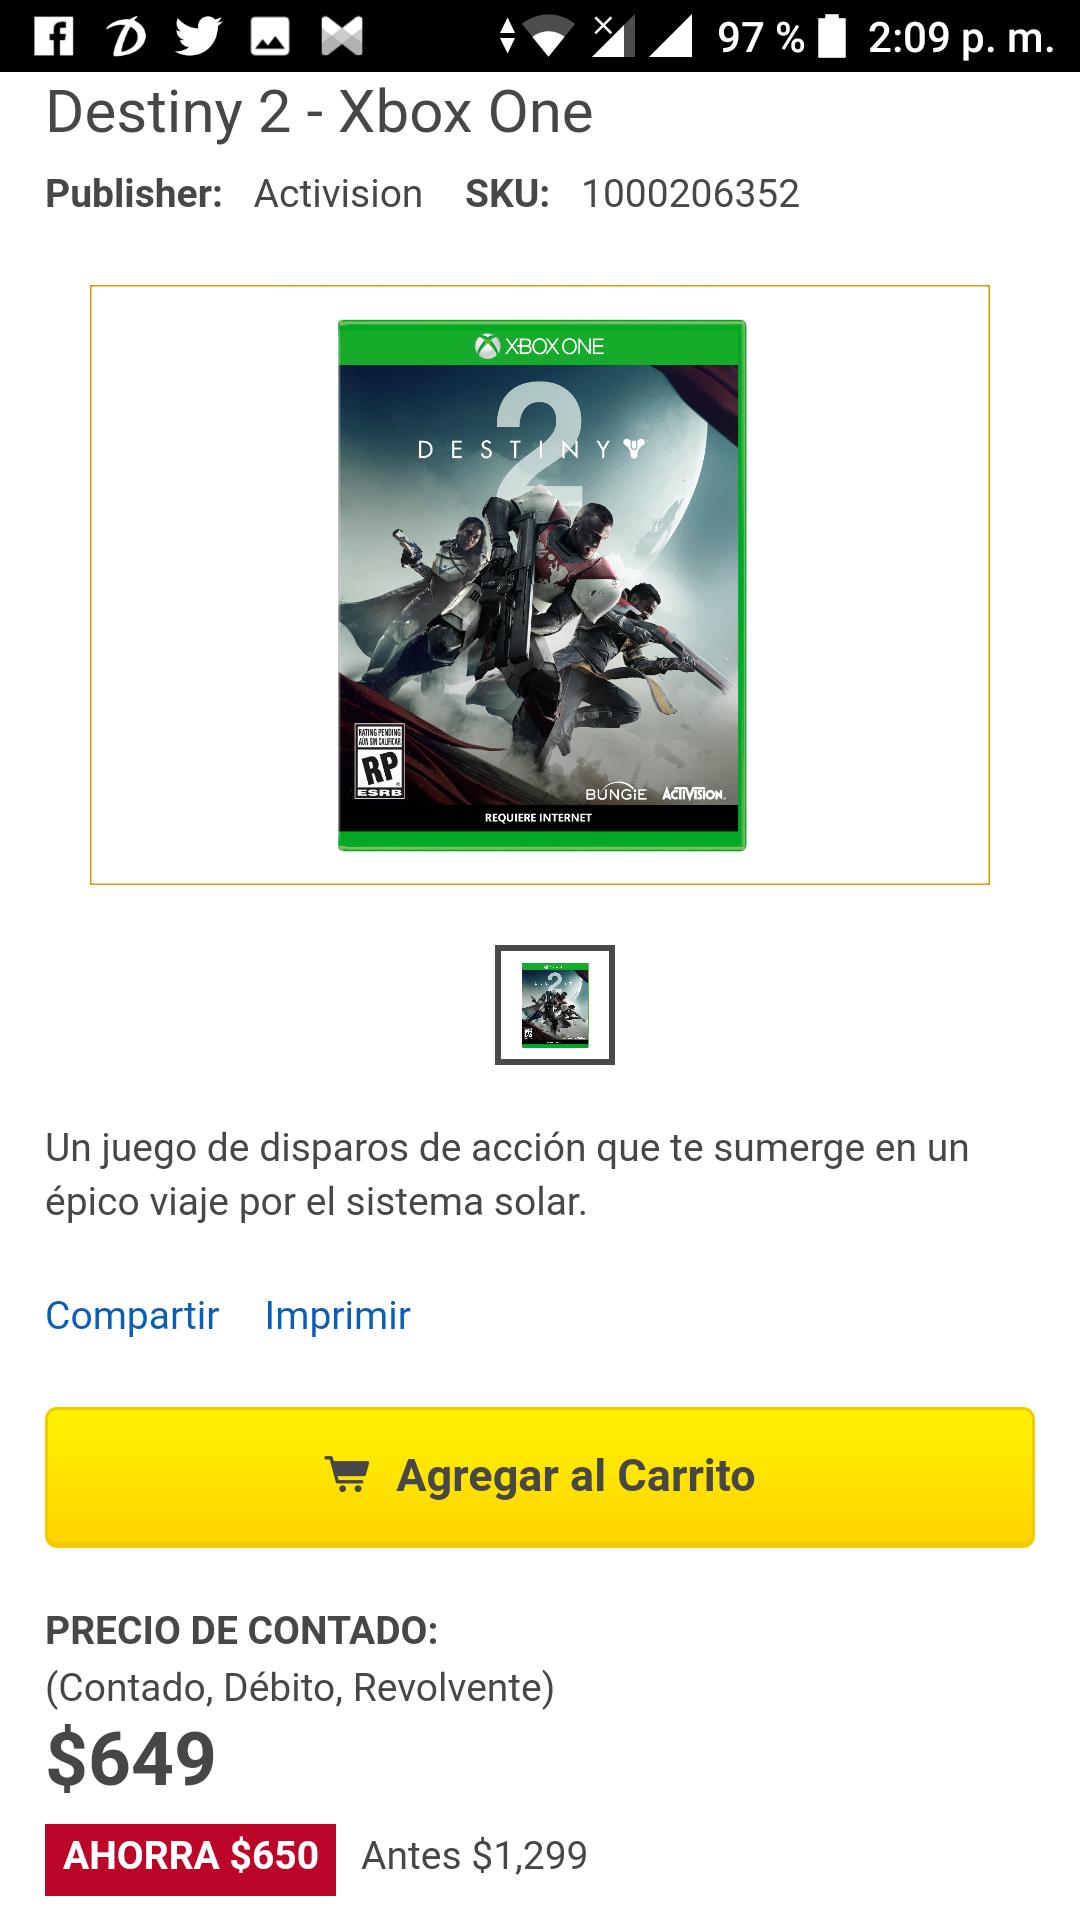 Best Buy: Destiny 2 Xbox one